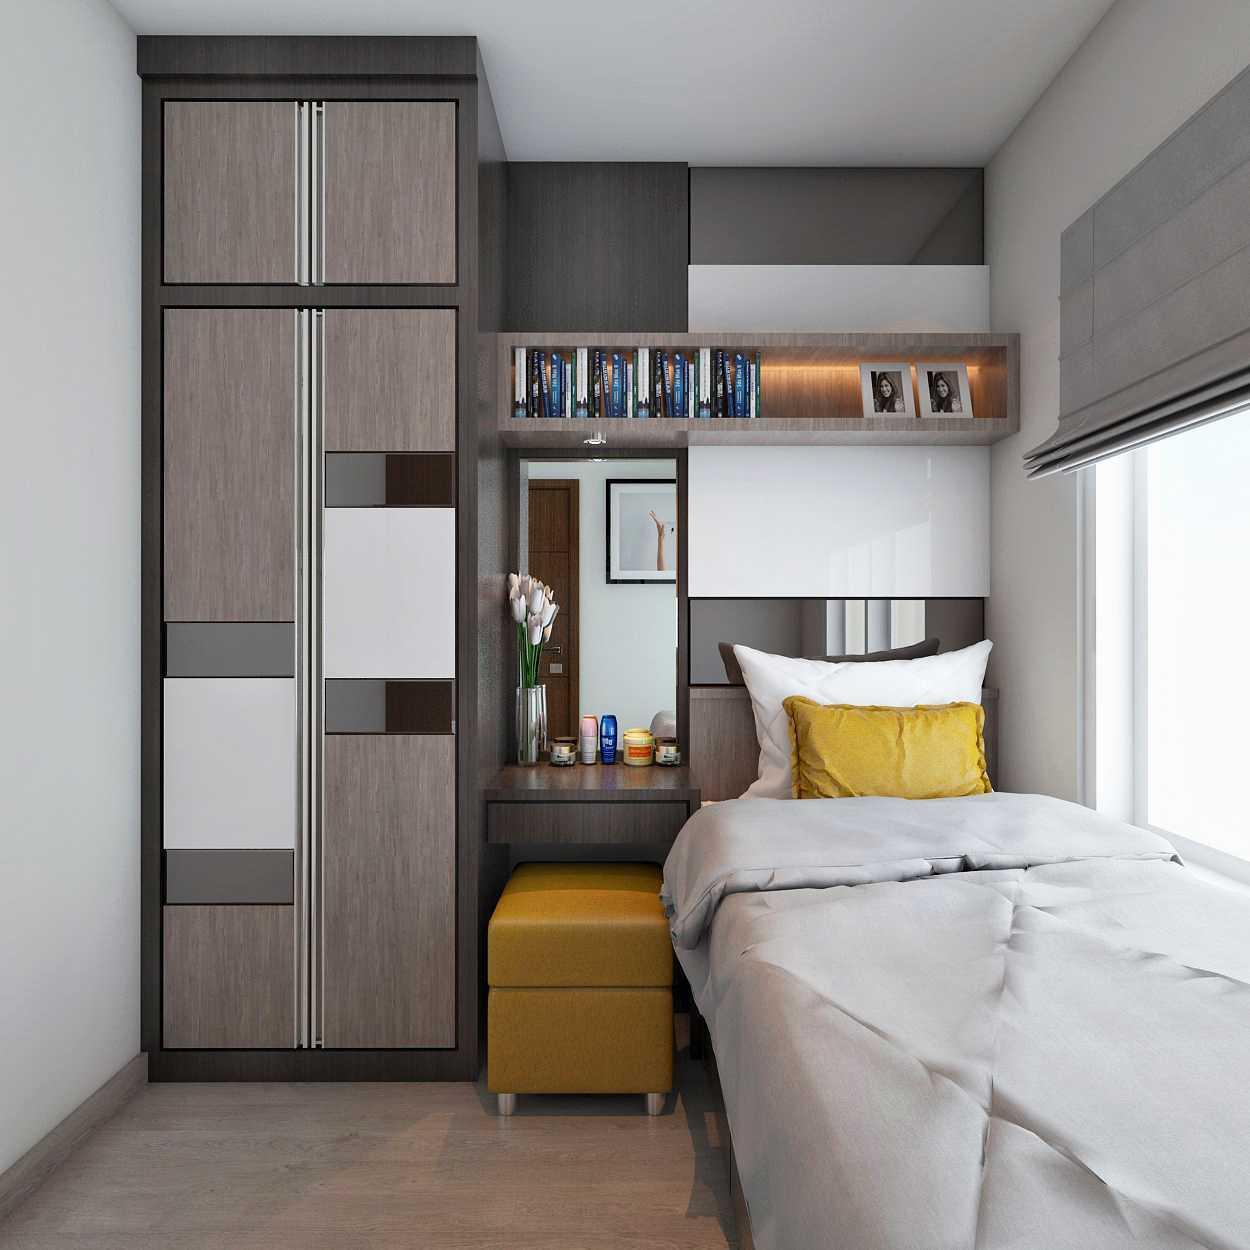 Habibullah Alfatih Condominium - Greenbay Pluit Jakarta, Indonesia Jakarta, Indonesia Kidroom-2 Kontemporer 35906